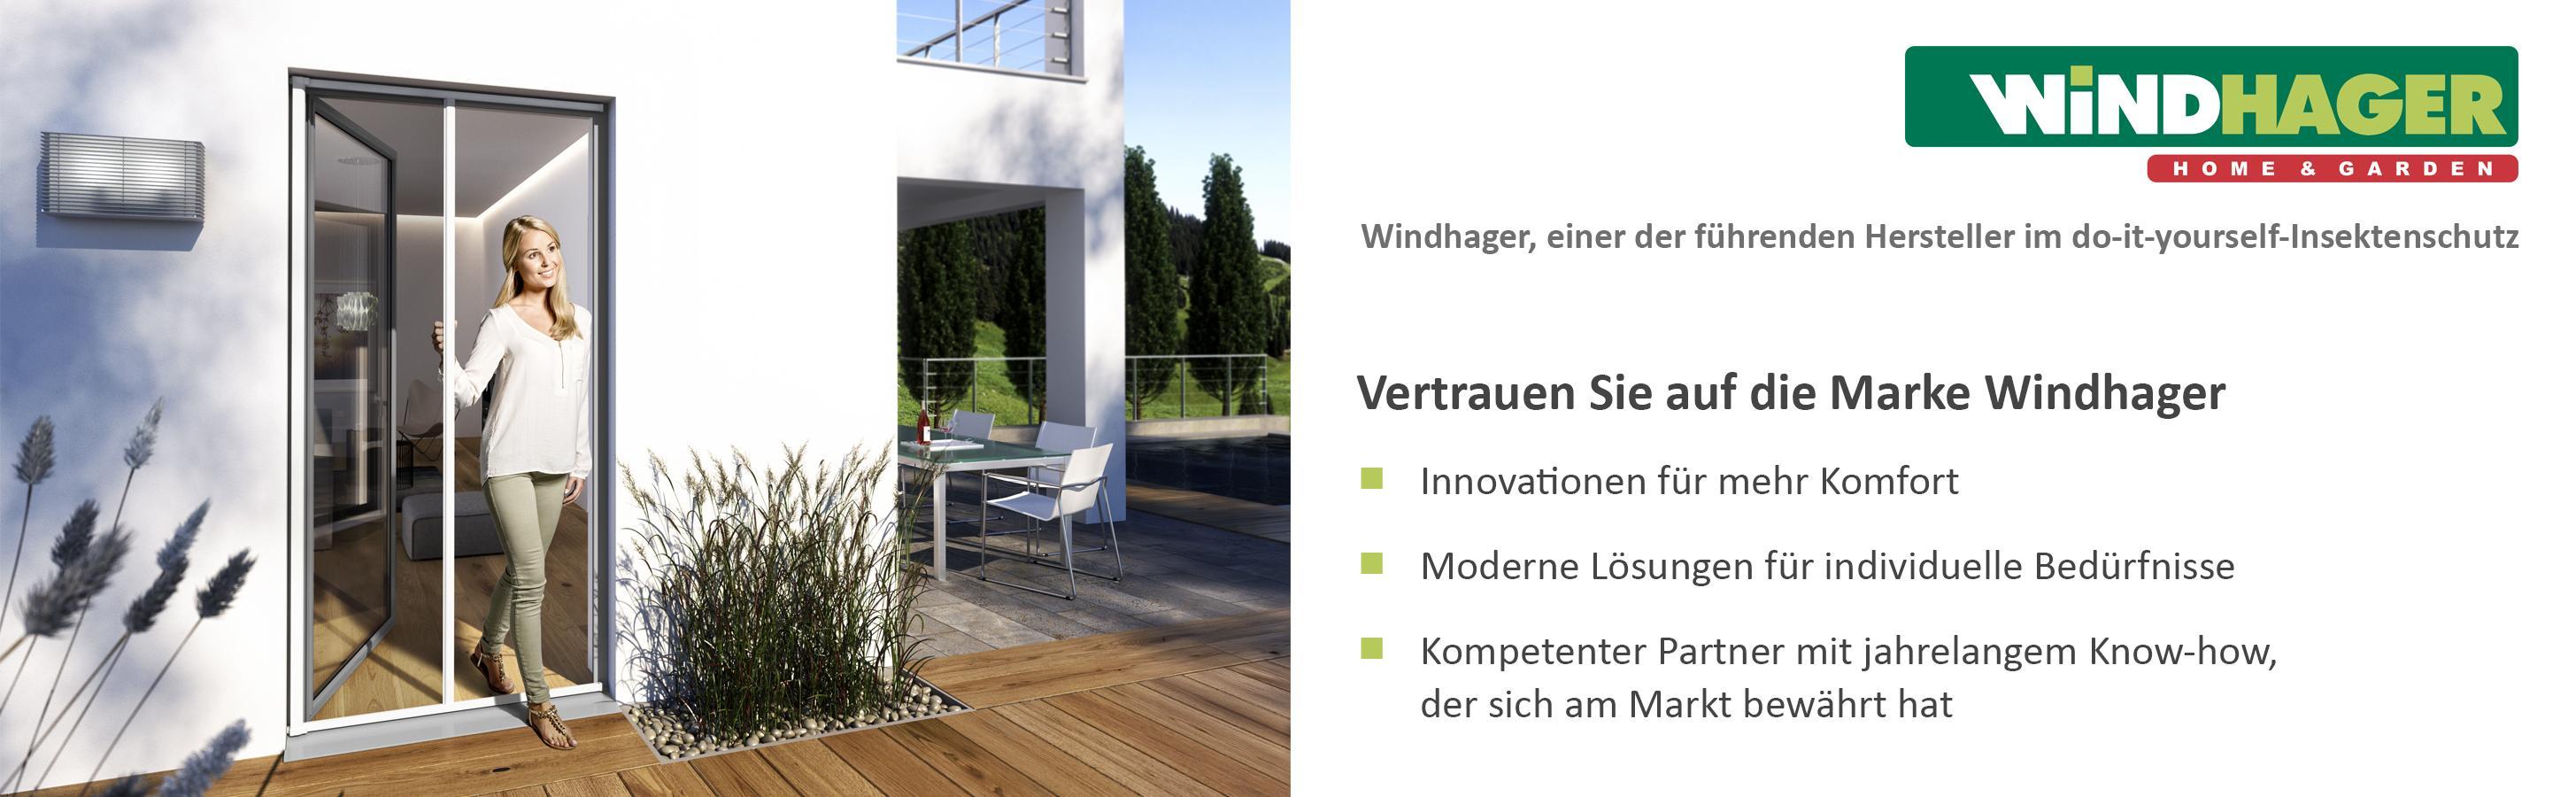 windhager insektenschutz aluminium rollo fliegengitter f r t ren balkont ren individuell. Black Bedroom Furniture Sets. Home Design Ideas